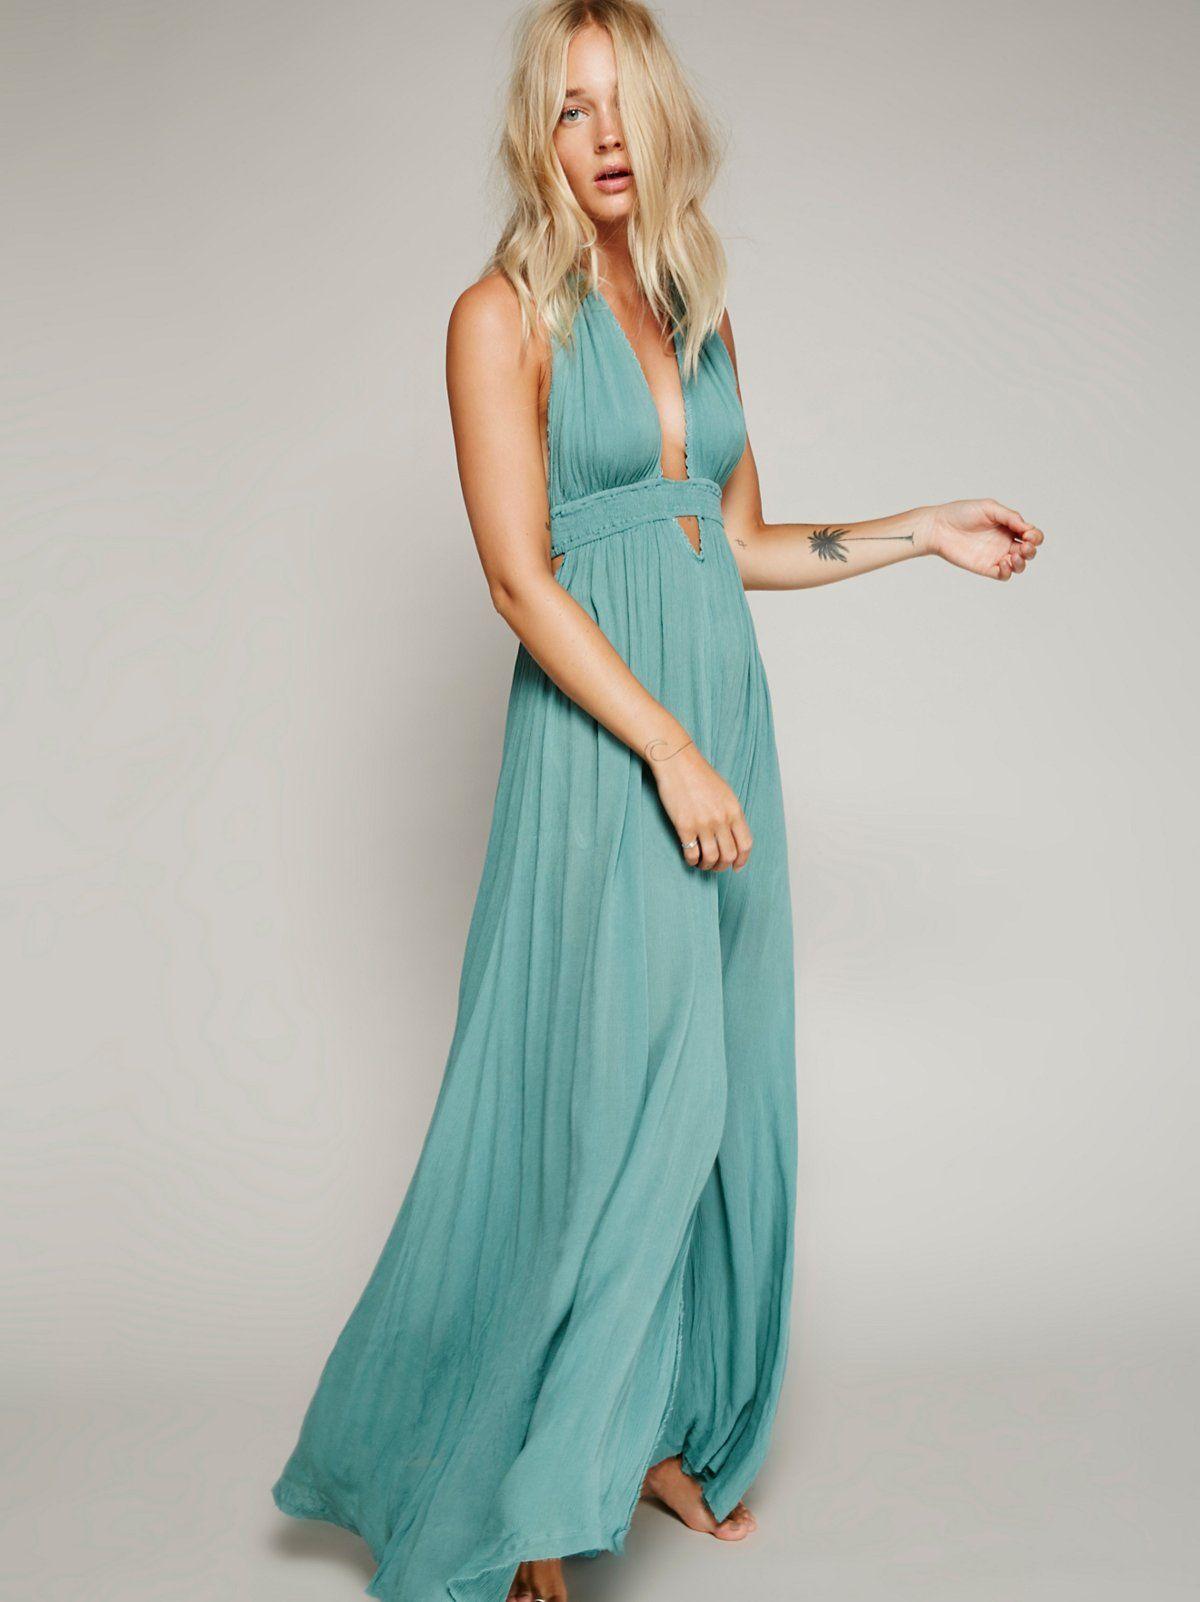 Look Into The Sun Maxi Dress Style Maxi Dress Maxi Dress Dresses [ 1602 x 1200 Pixel ]